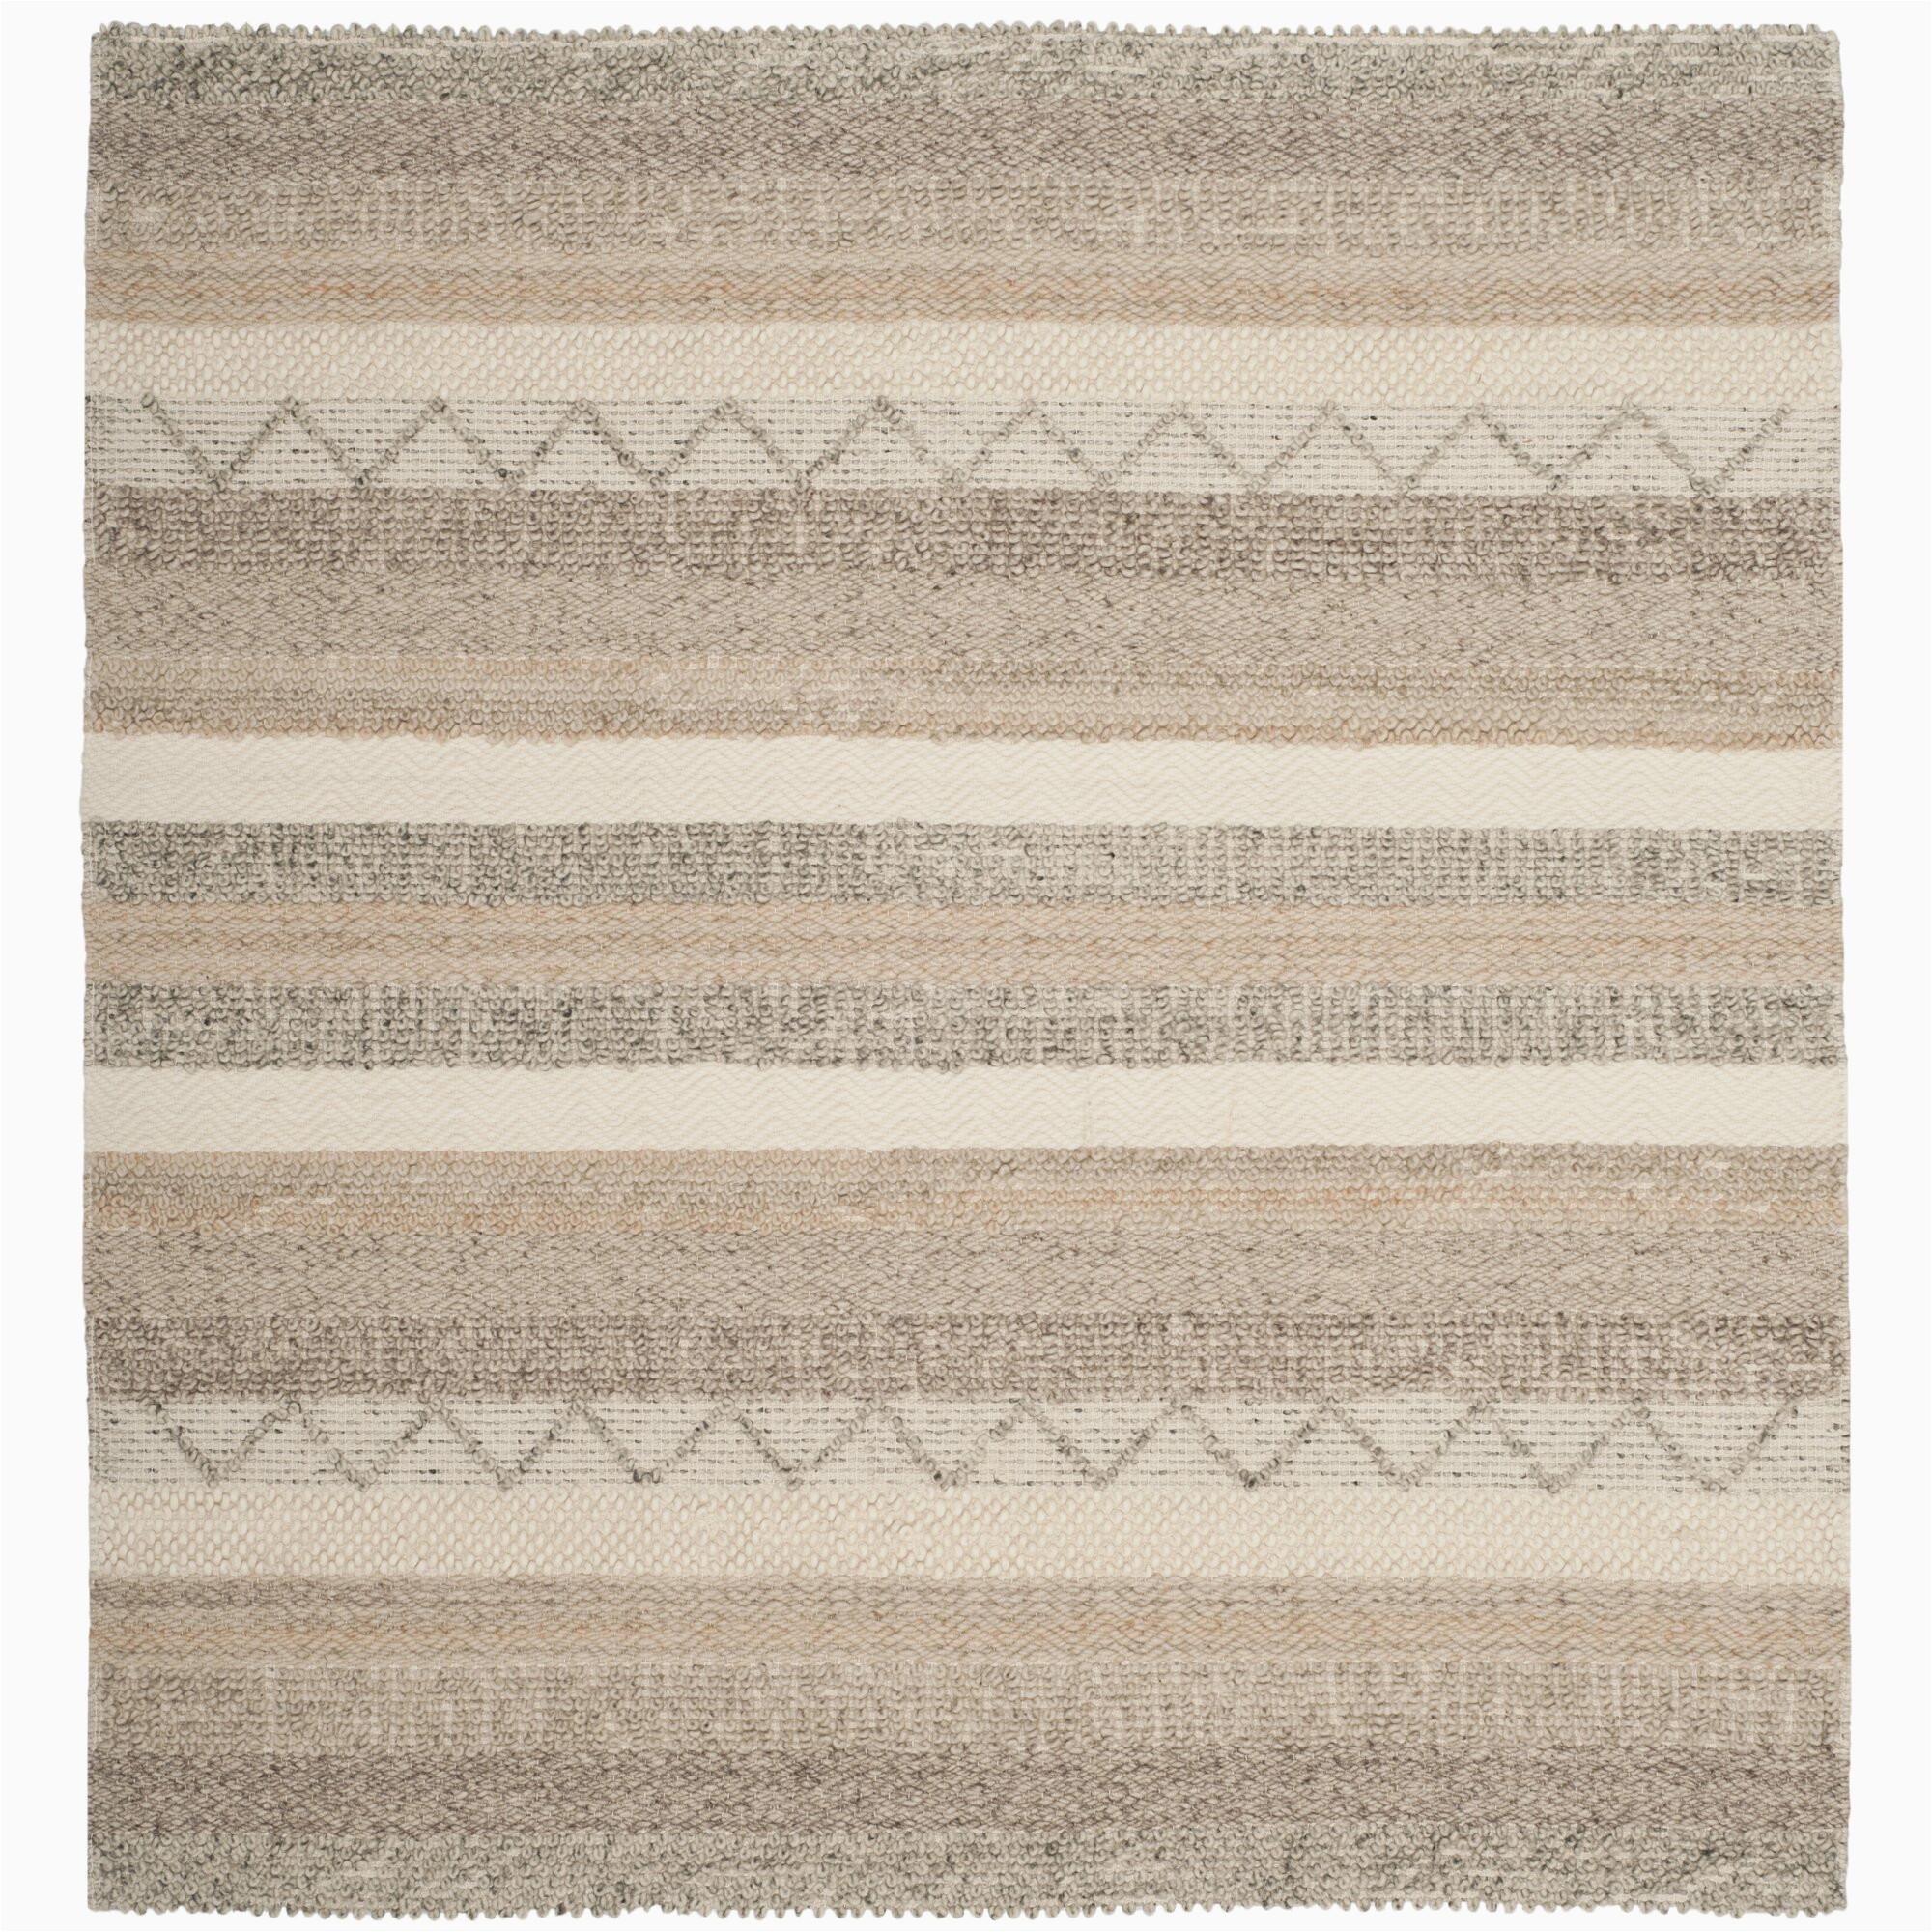 langley street daytona beach hand tufted beige area rug lgly4049